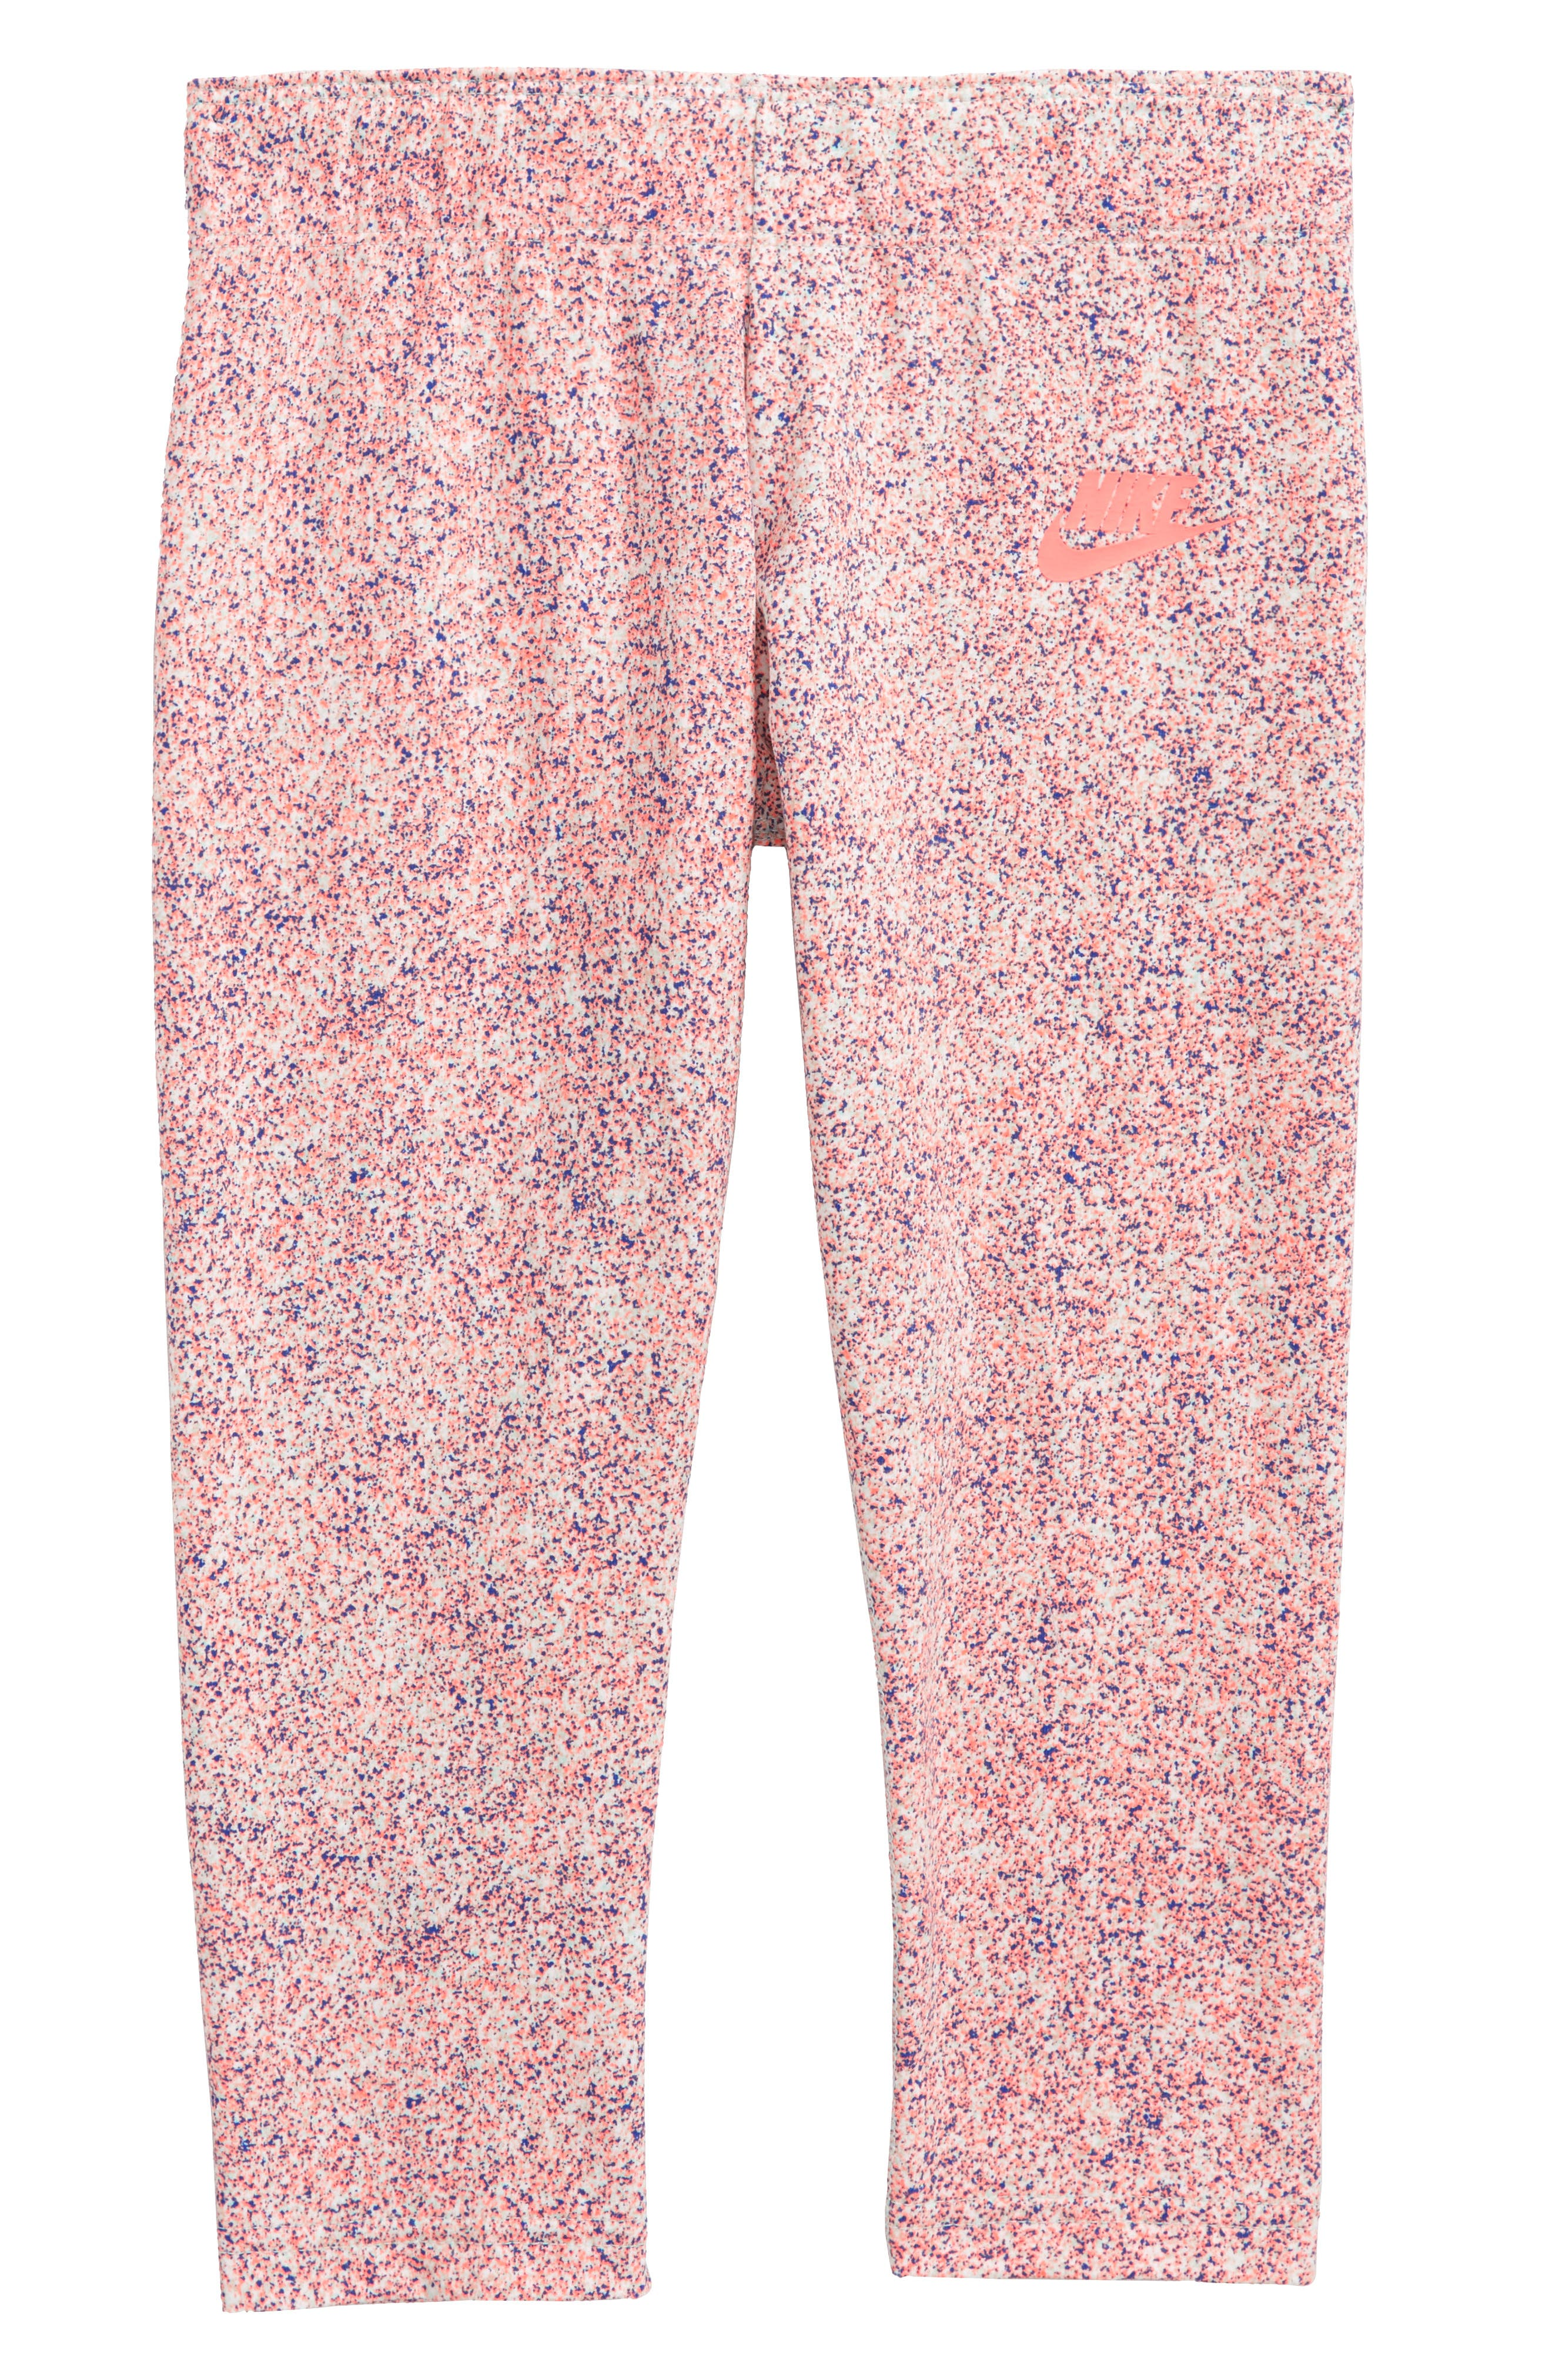 Sportswear AOP Crop Leggings,                             Main thumbnail 1, color,                             814